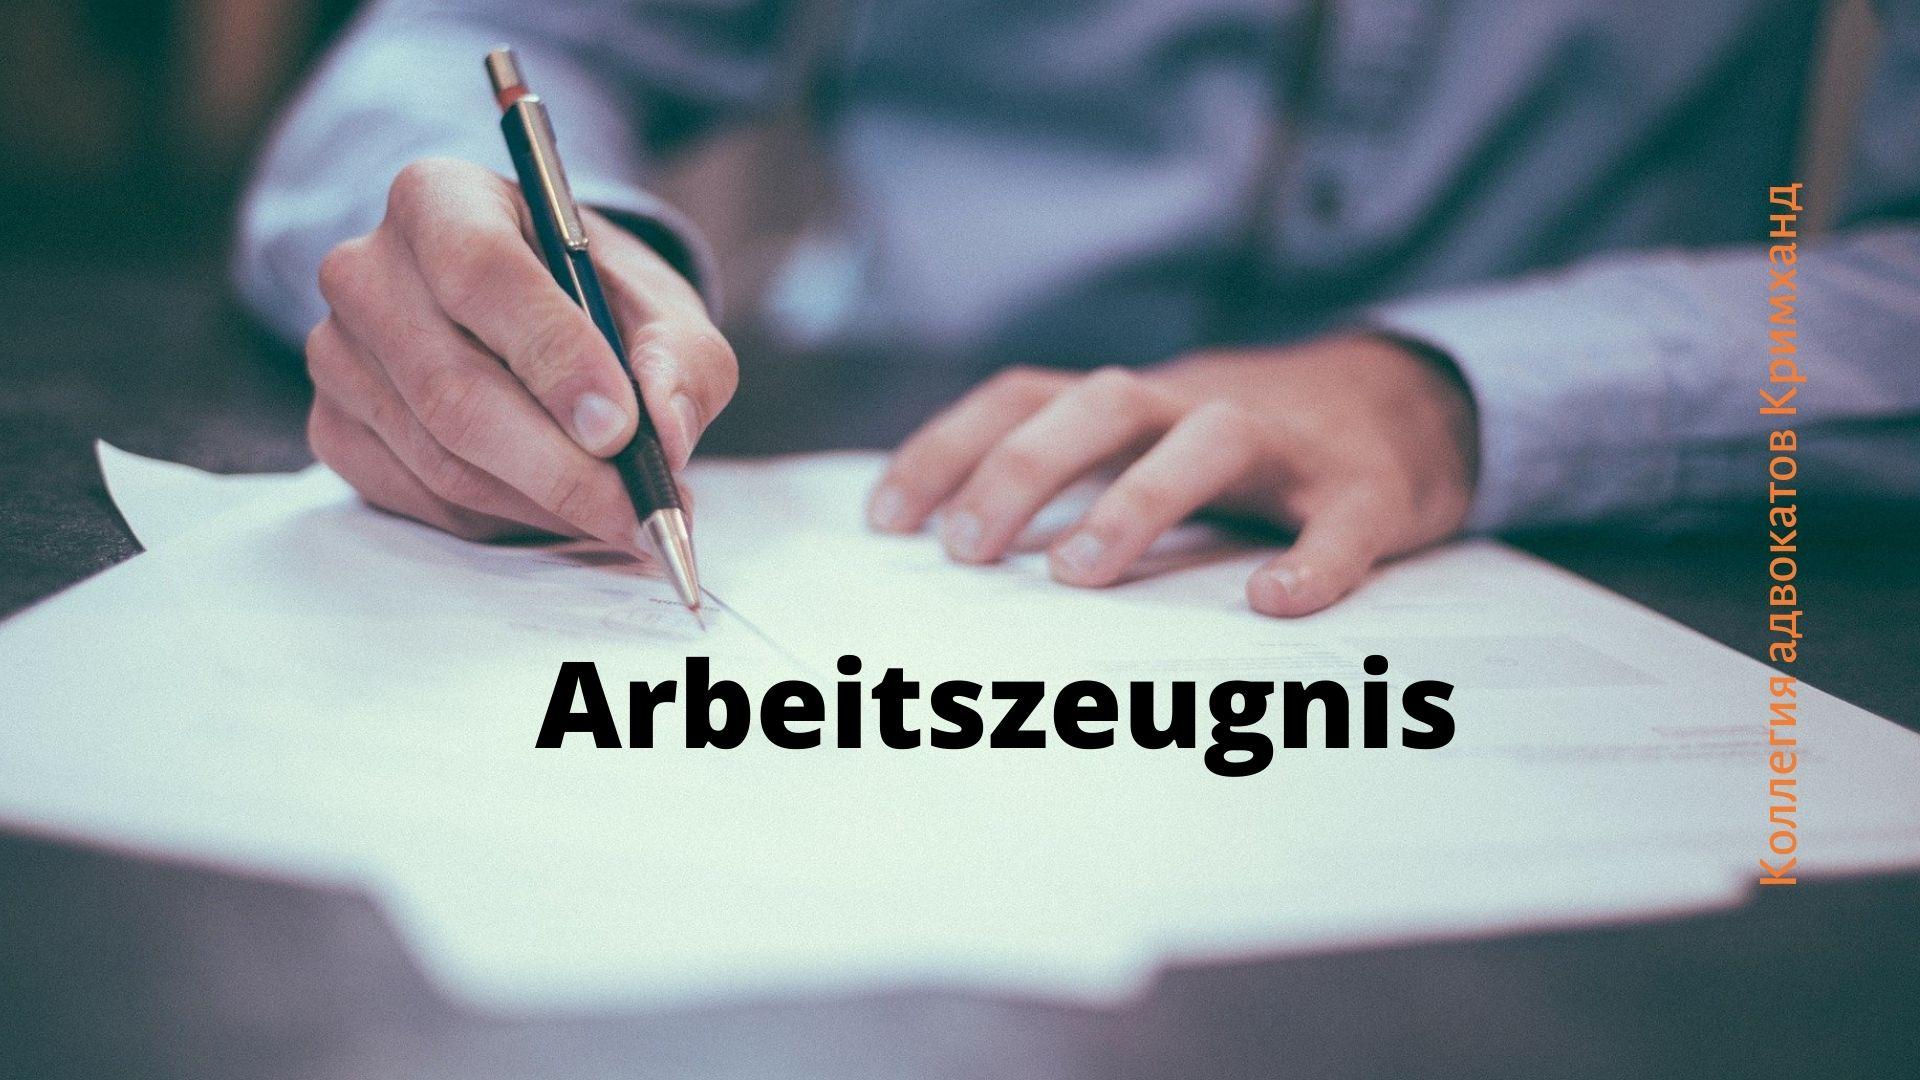 Характеристика с места работы при увольнении [Arbeitszeugnis]